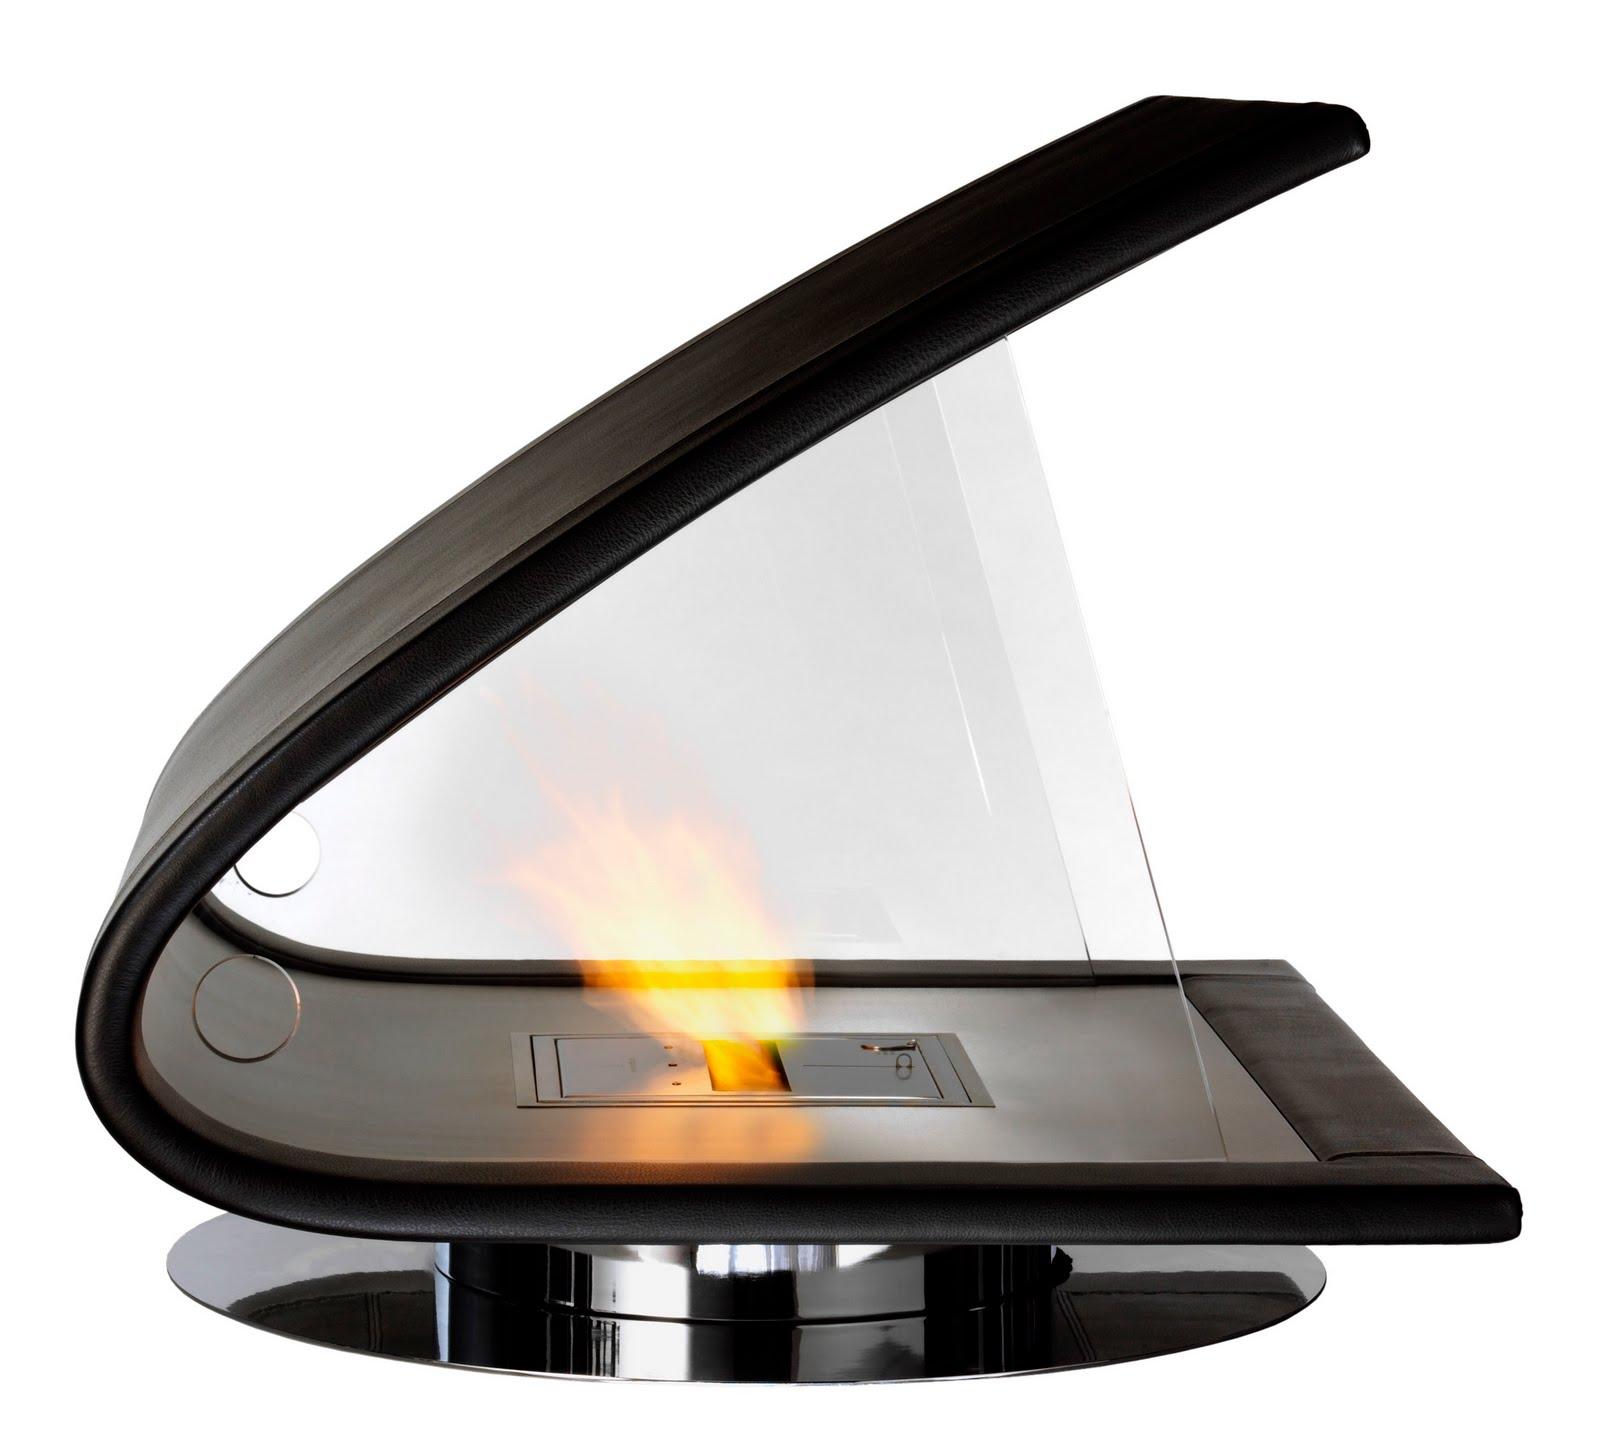 modern interior design zeta modern ecosmart fire ventless  - ecosmart zeta ventless fireplace · click above image for a large detailedview